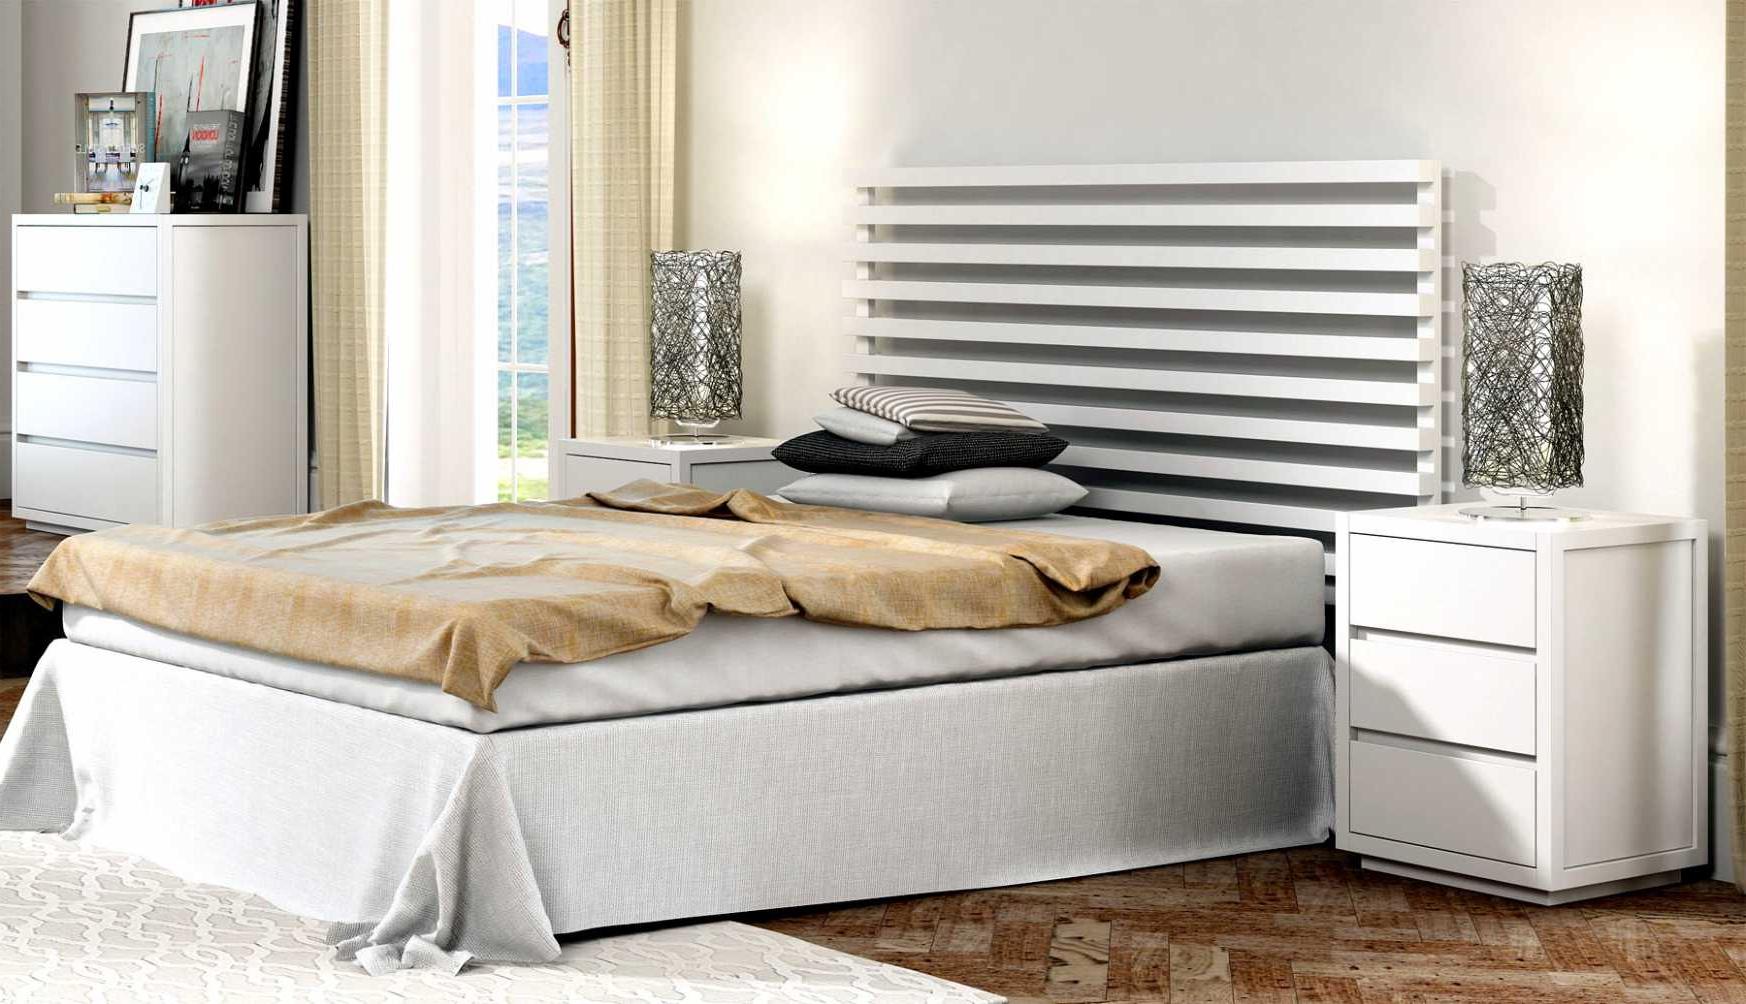 Sillas Dormitorio Ikea S1du Sillas Dormitorio Juvenil Ikea Ideas Shanerucopy